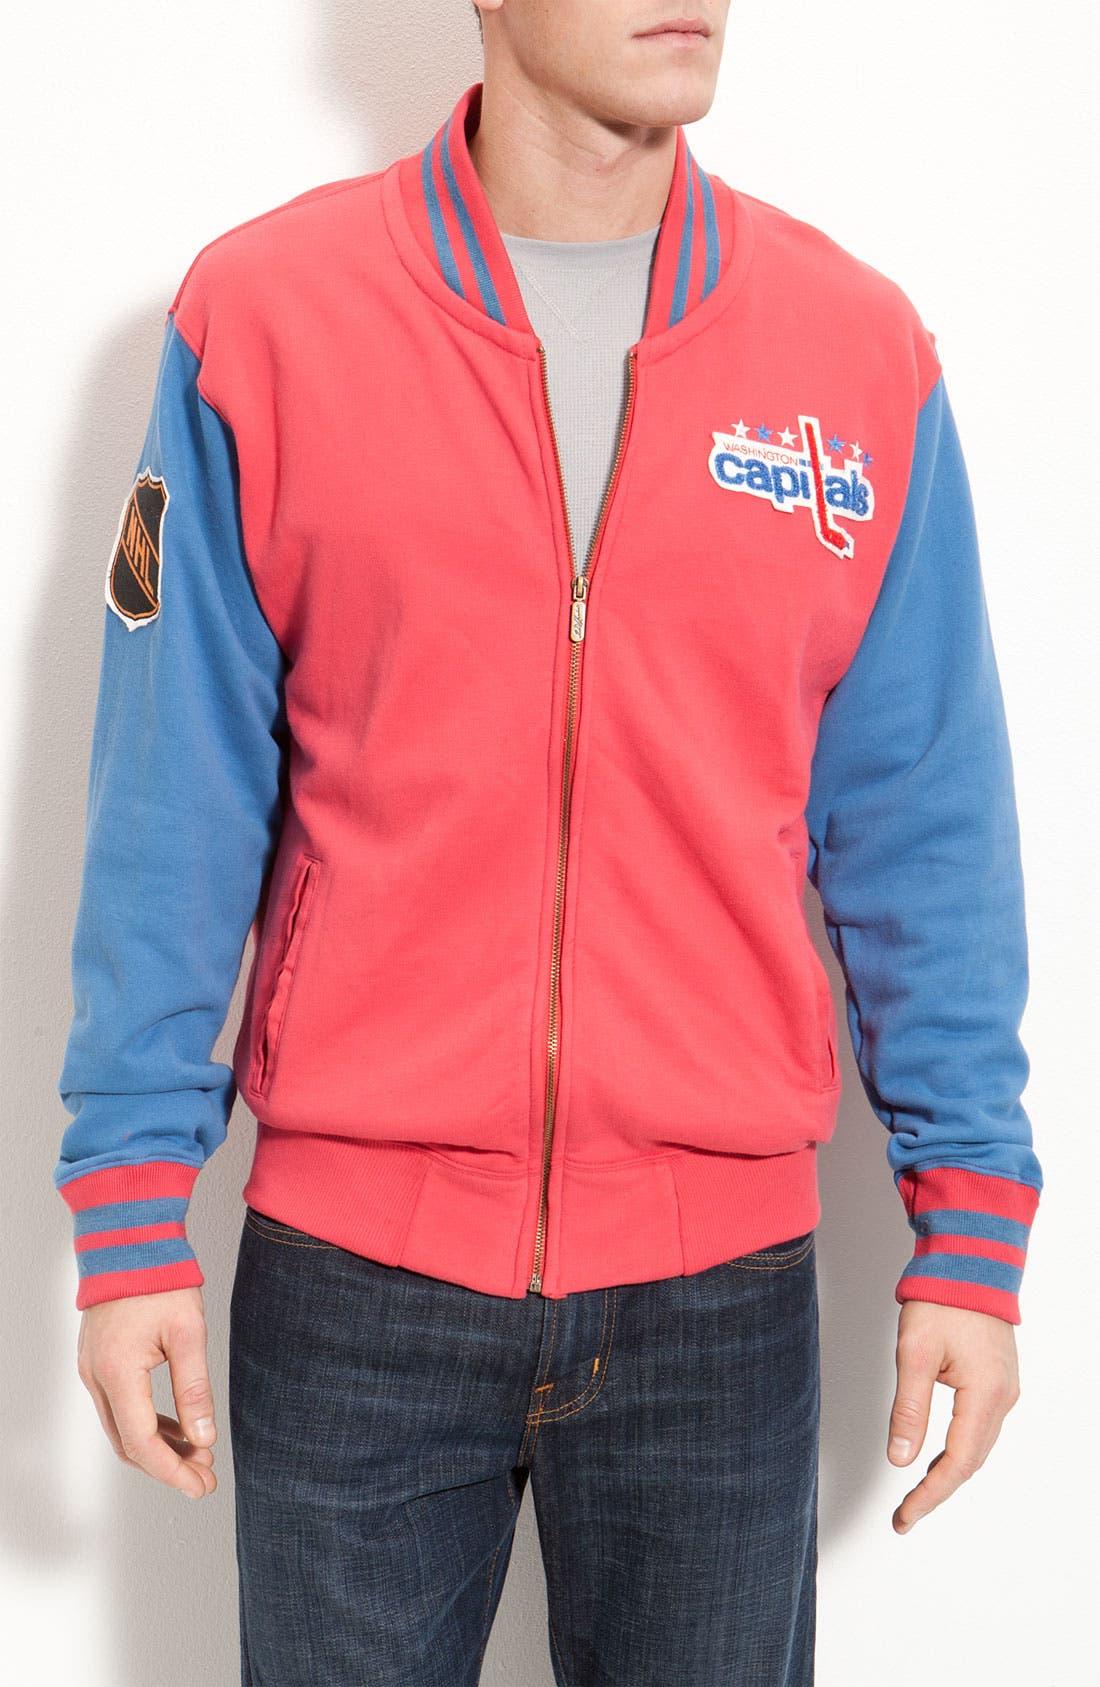 Main Image - Red Jacket 'Homeroom Capitals' Jacket